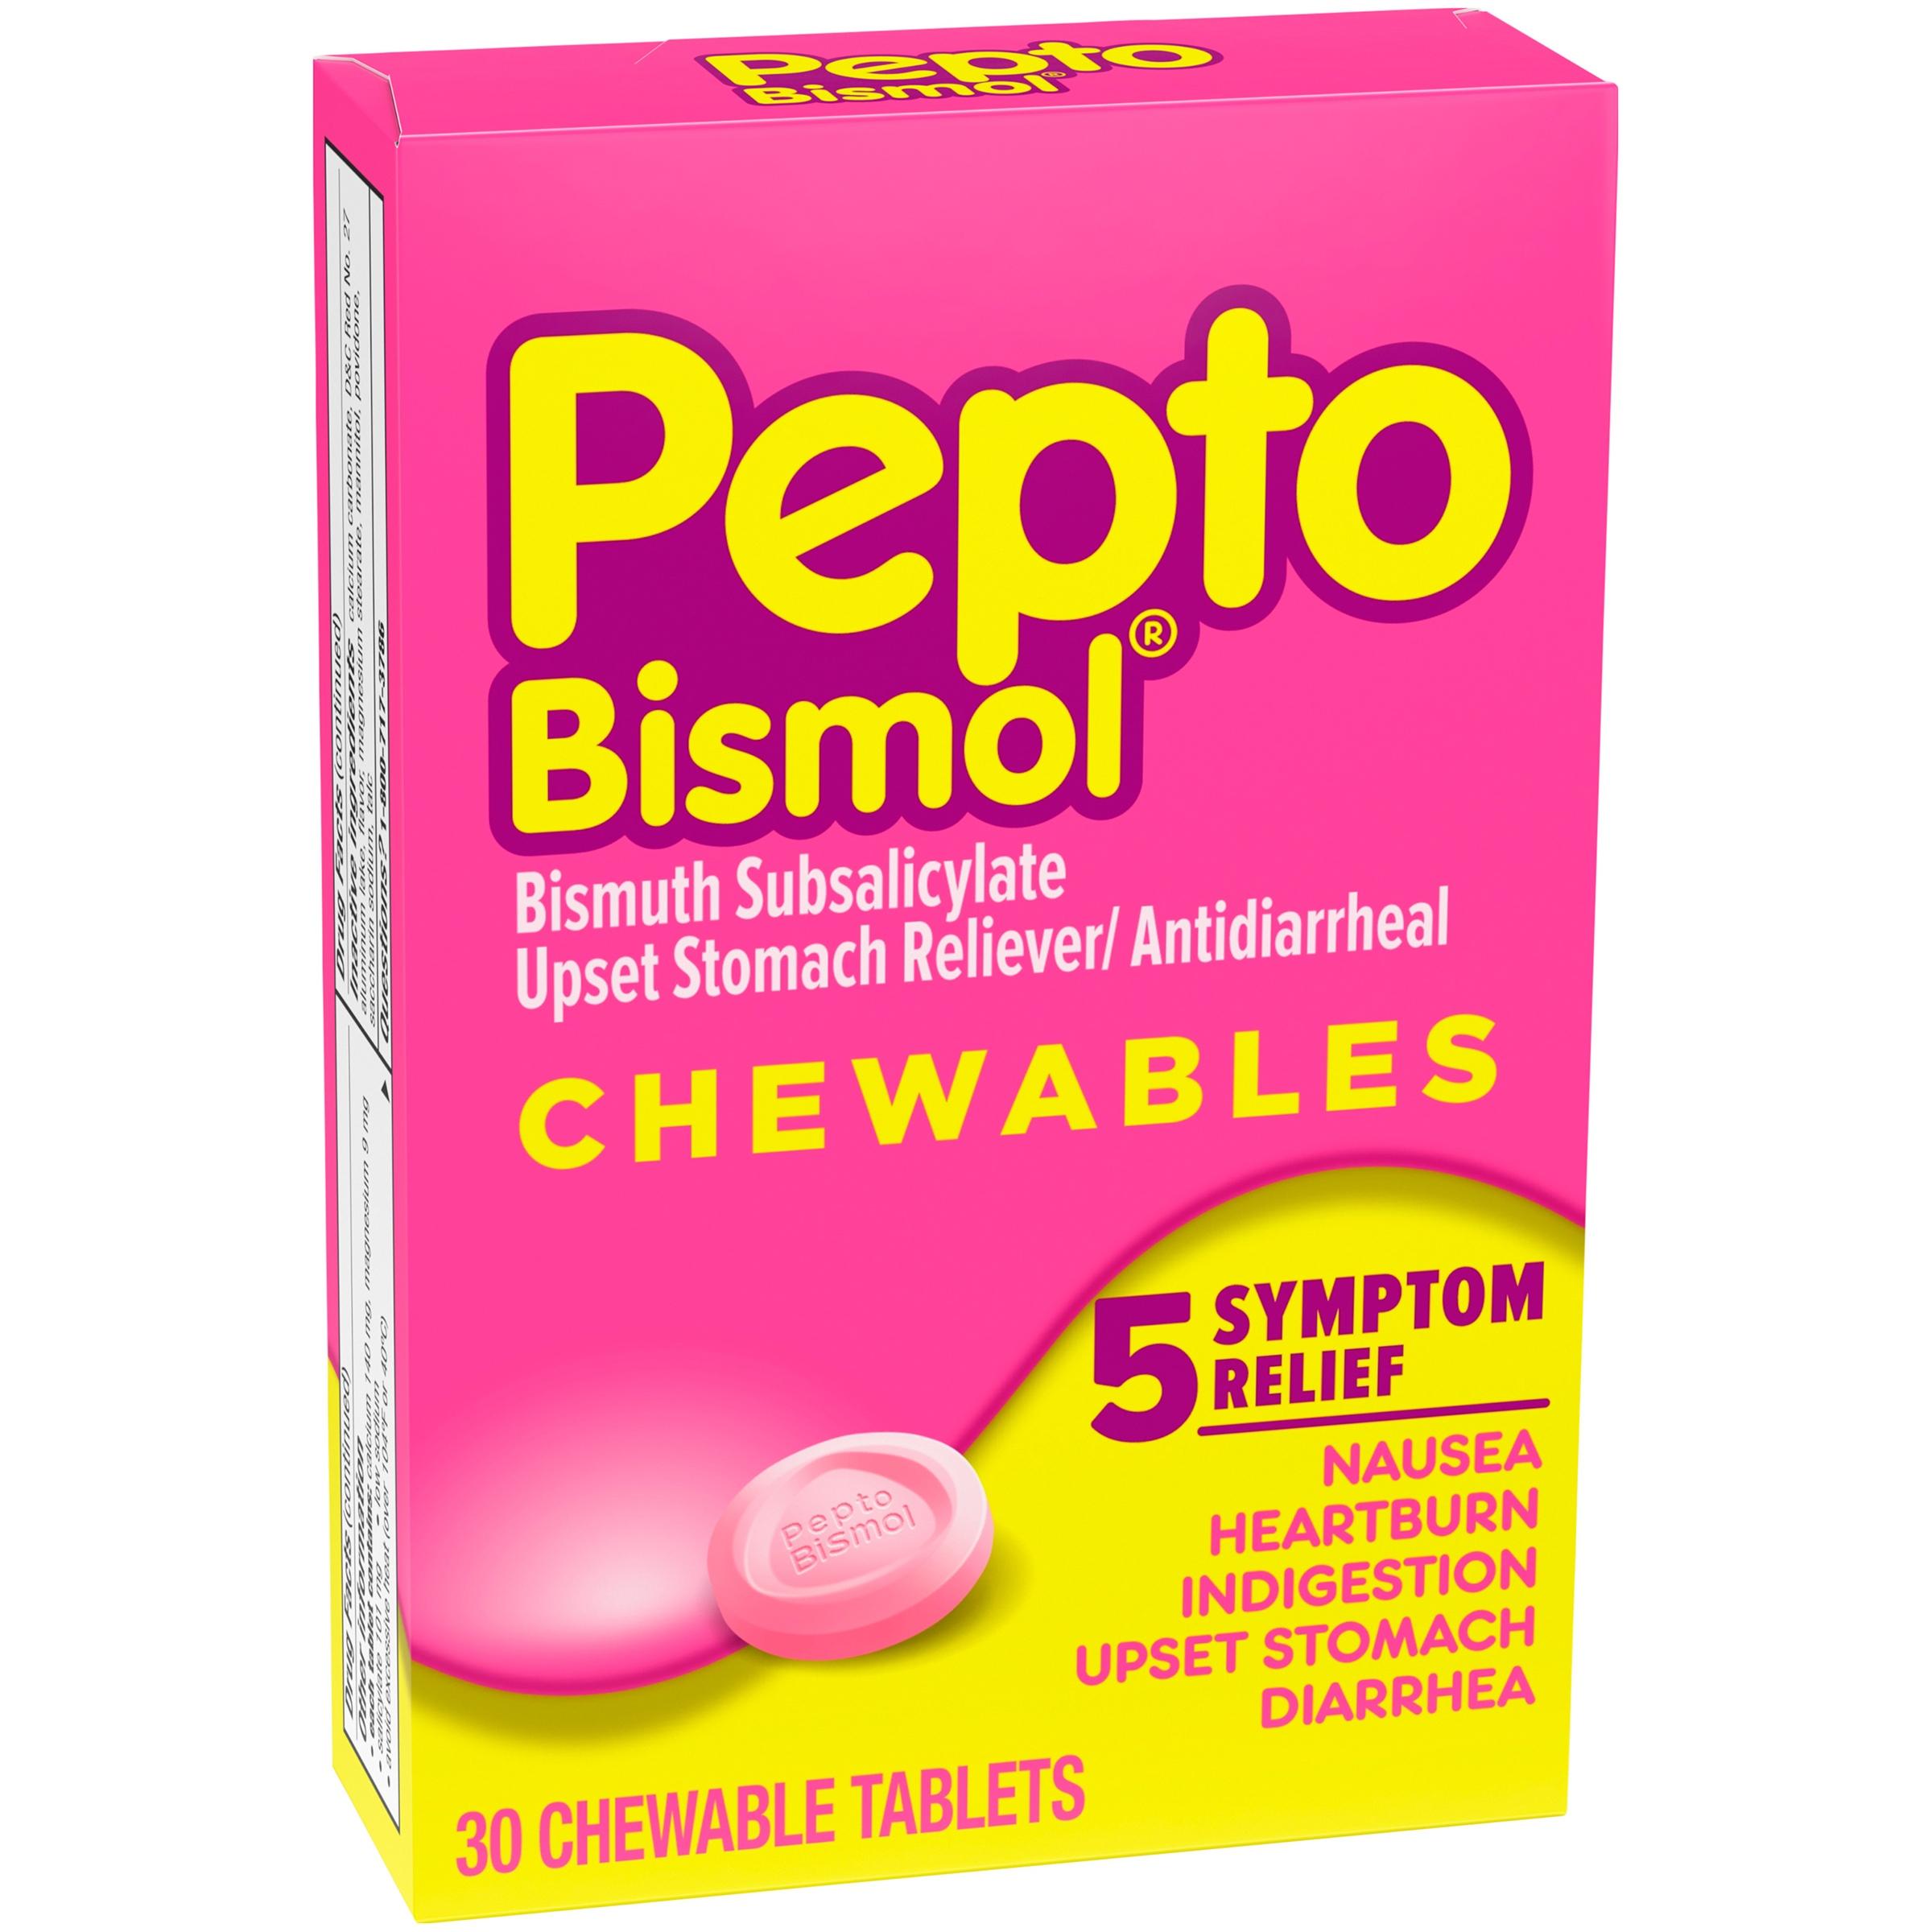 Pepto-Bismol® Digestive Symptom Relief Chewable Tablets 30 ct Box